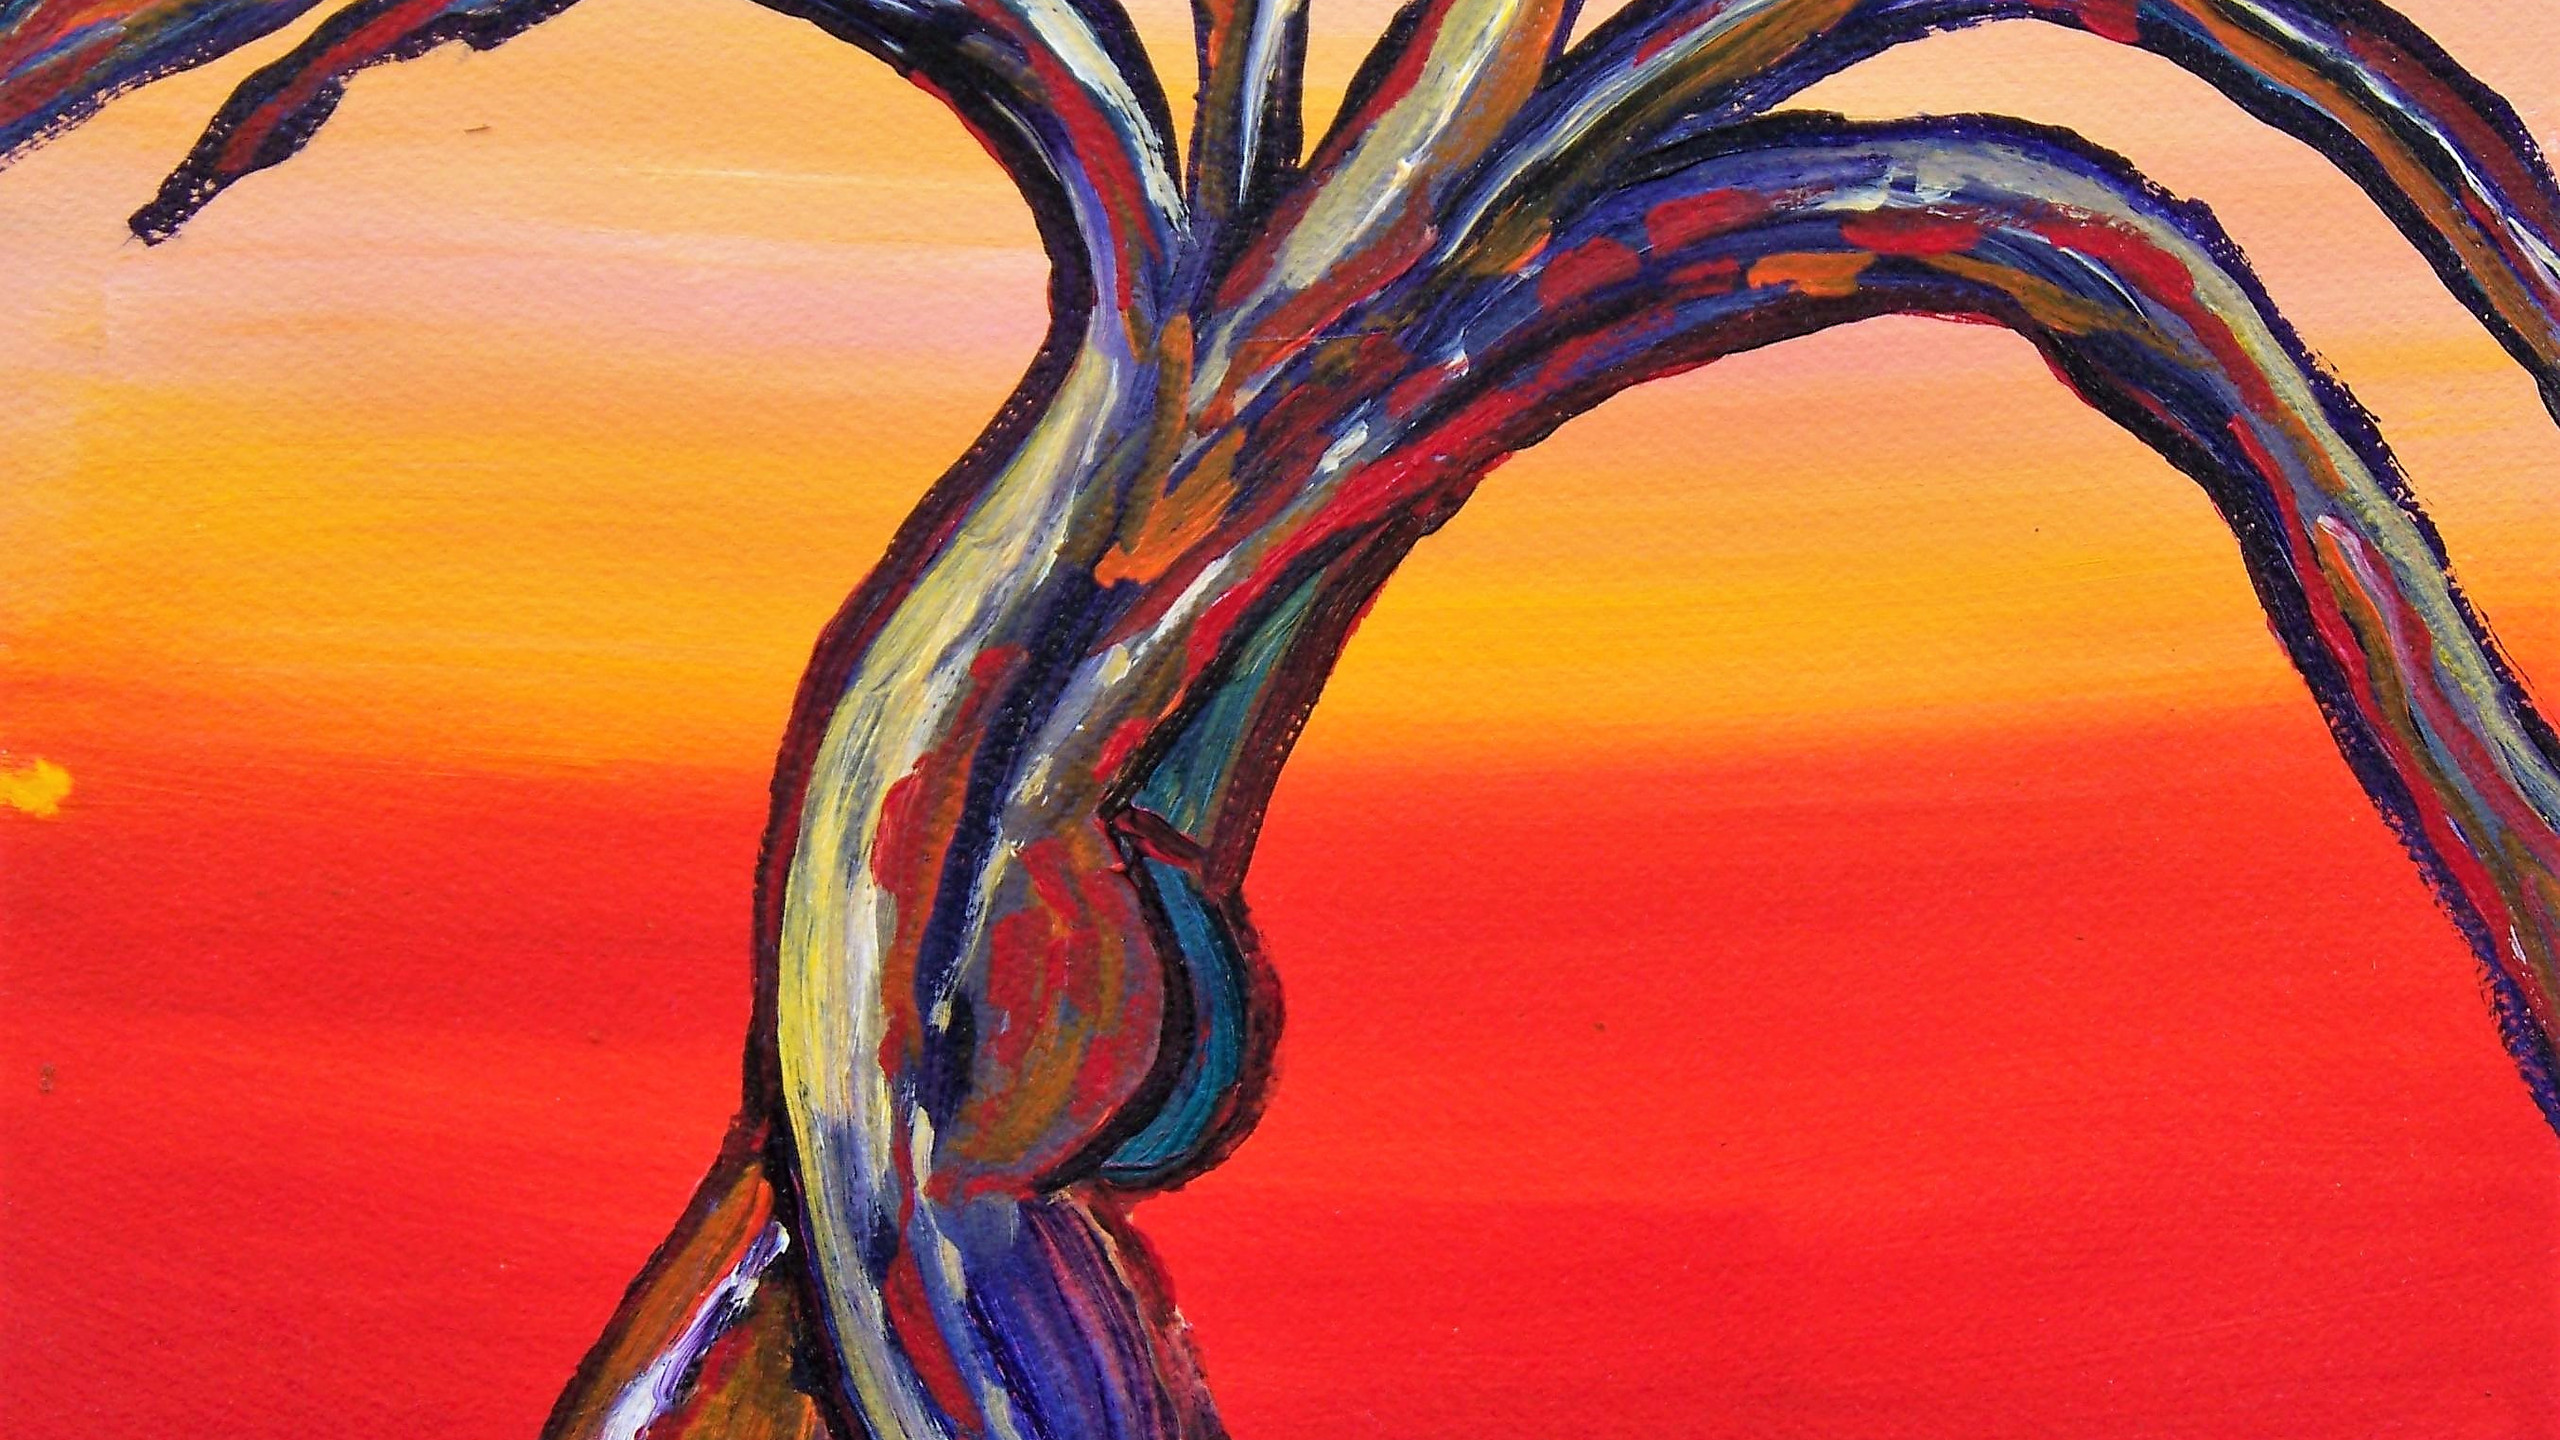 'Dancing tree' (1997)